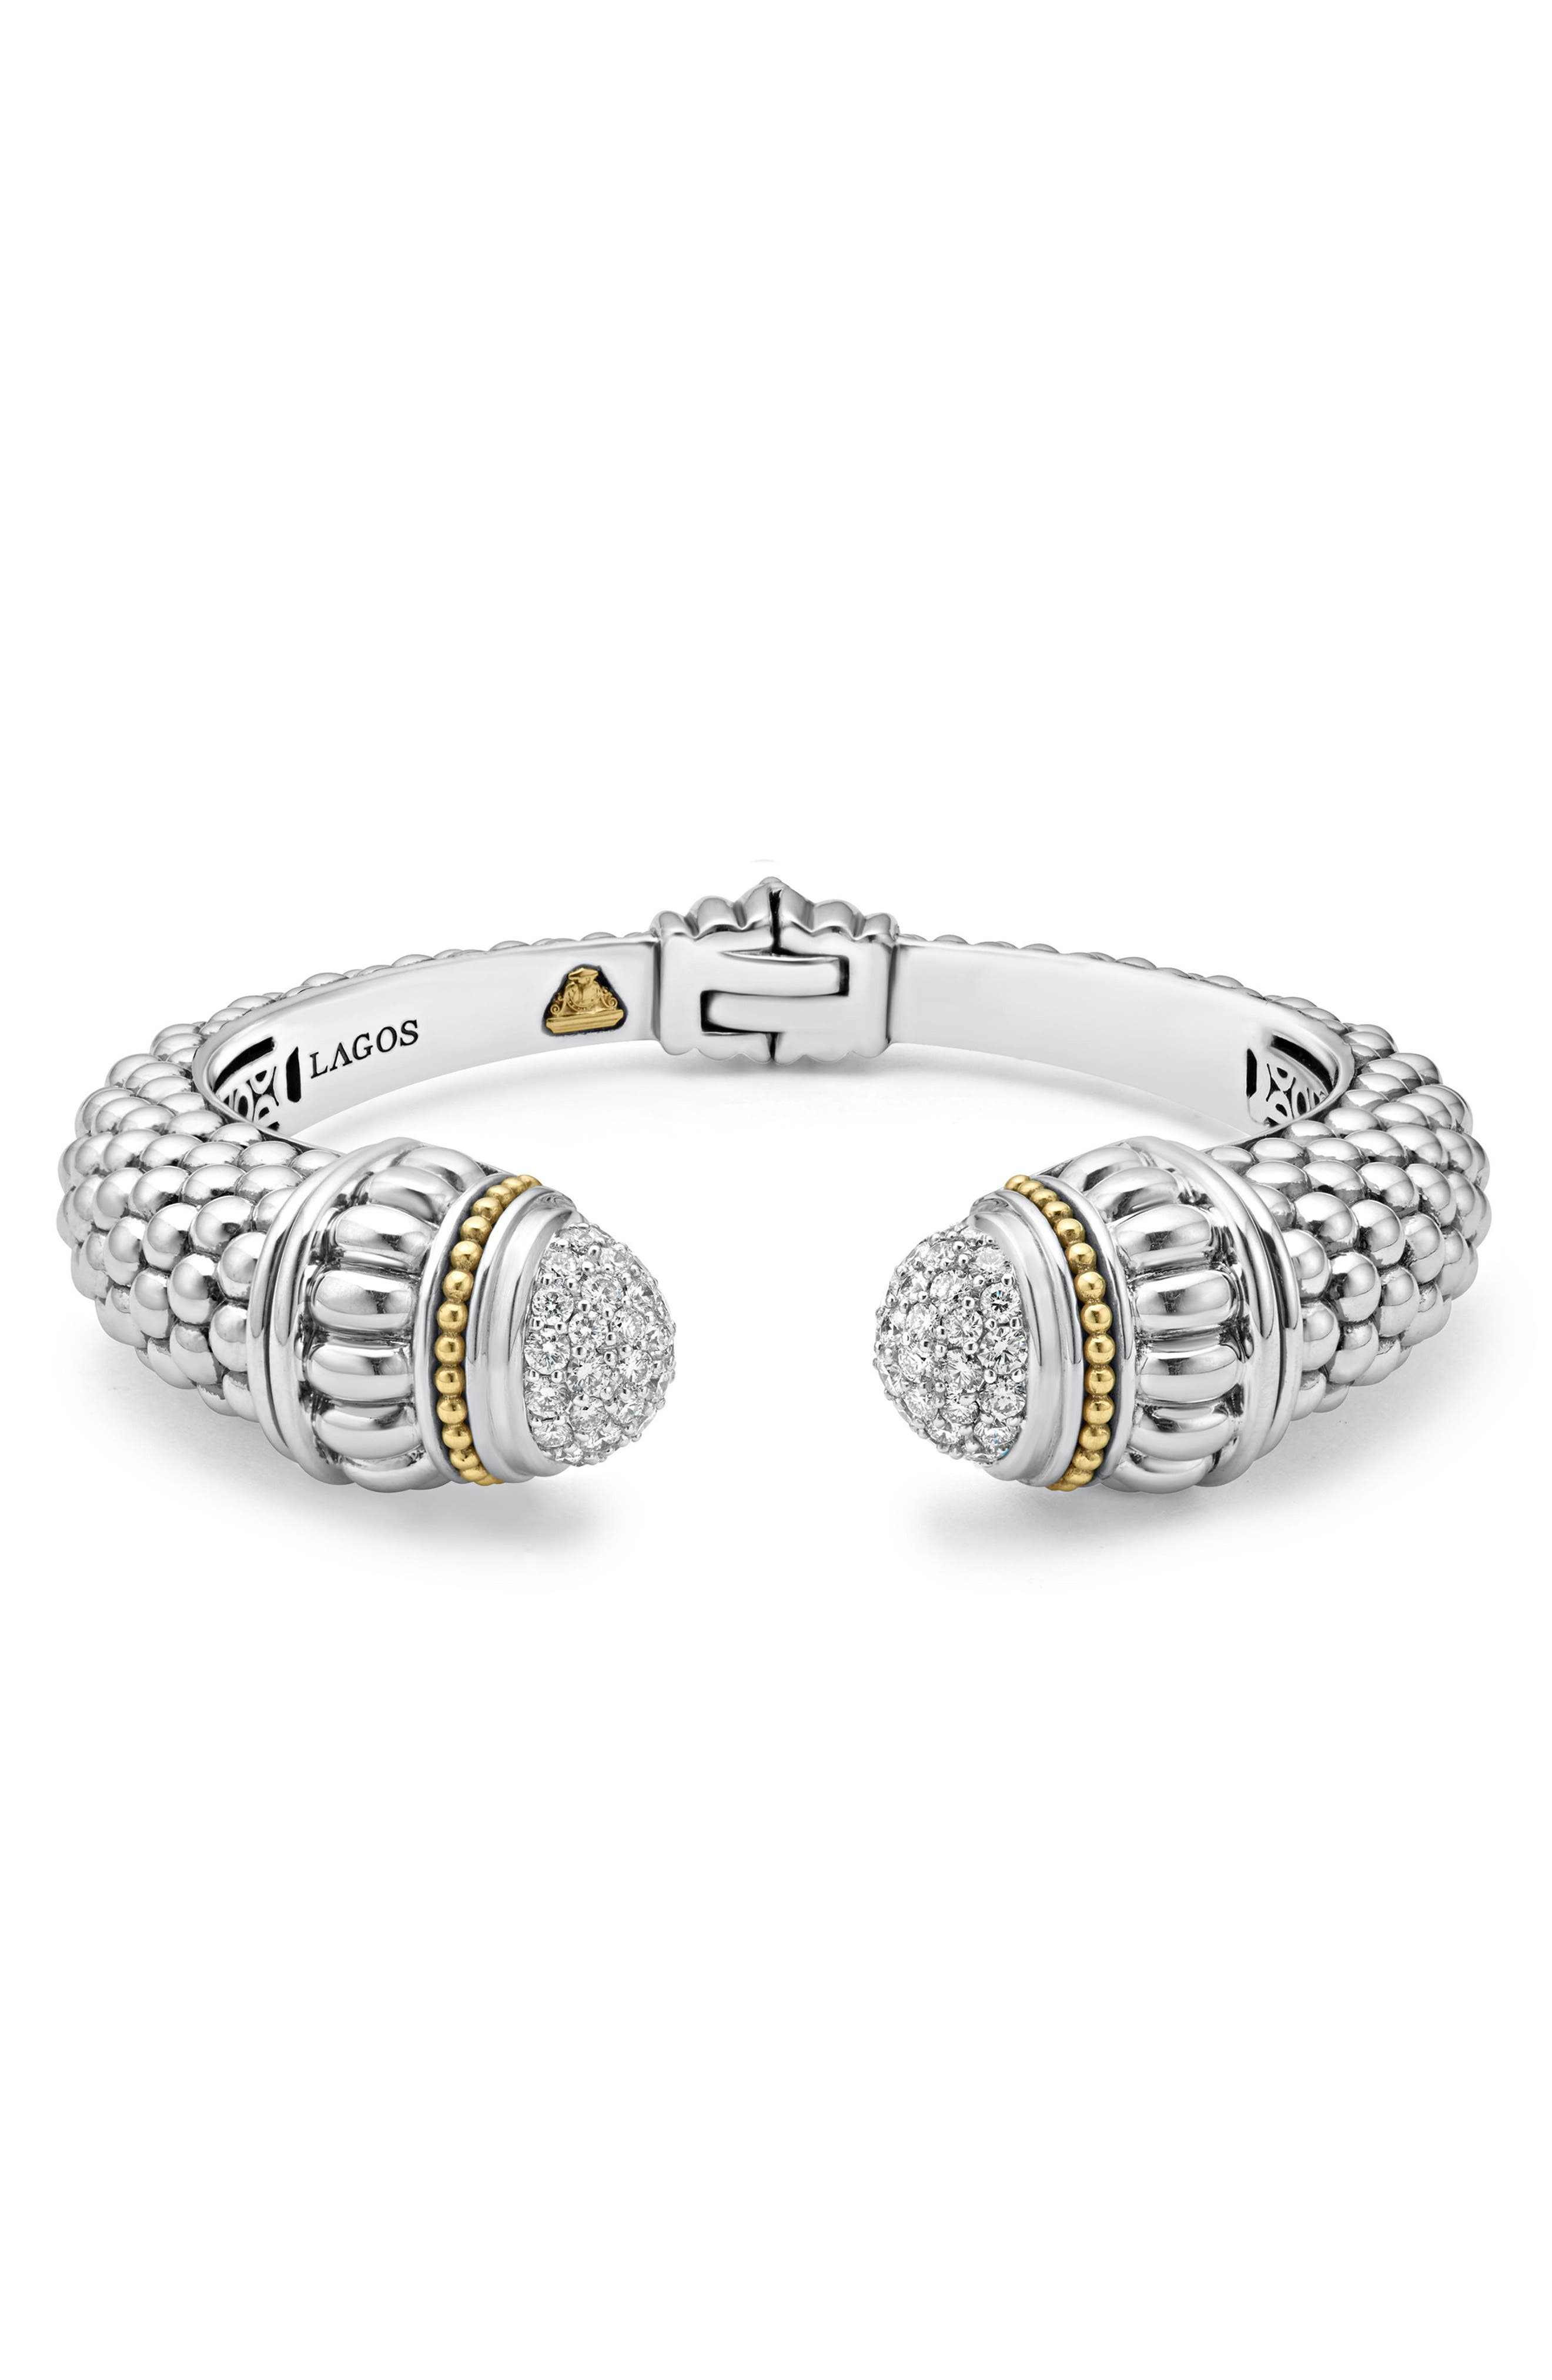 Alternate Image 1 Selected - LAGOS Caviar Diamond Hinge Cuff